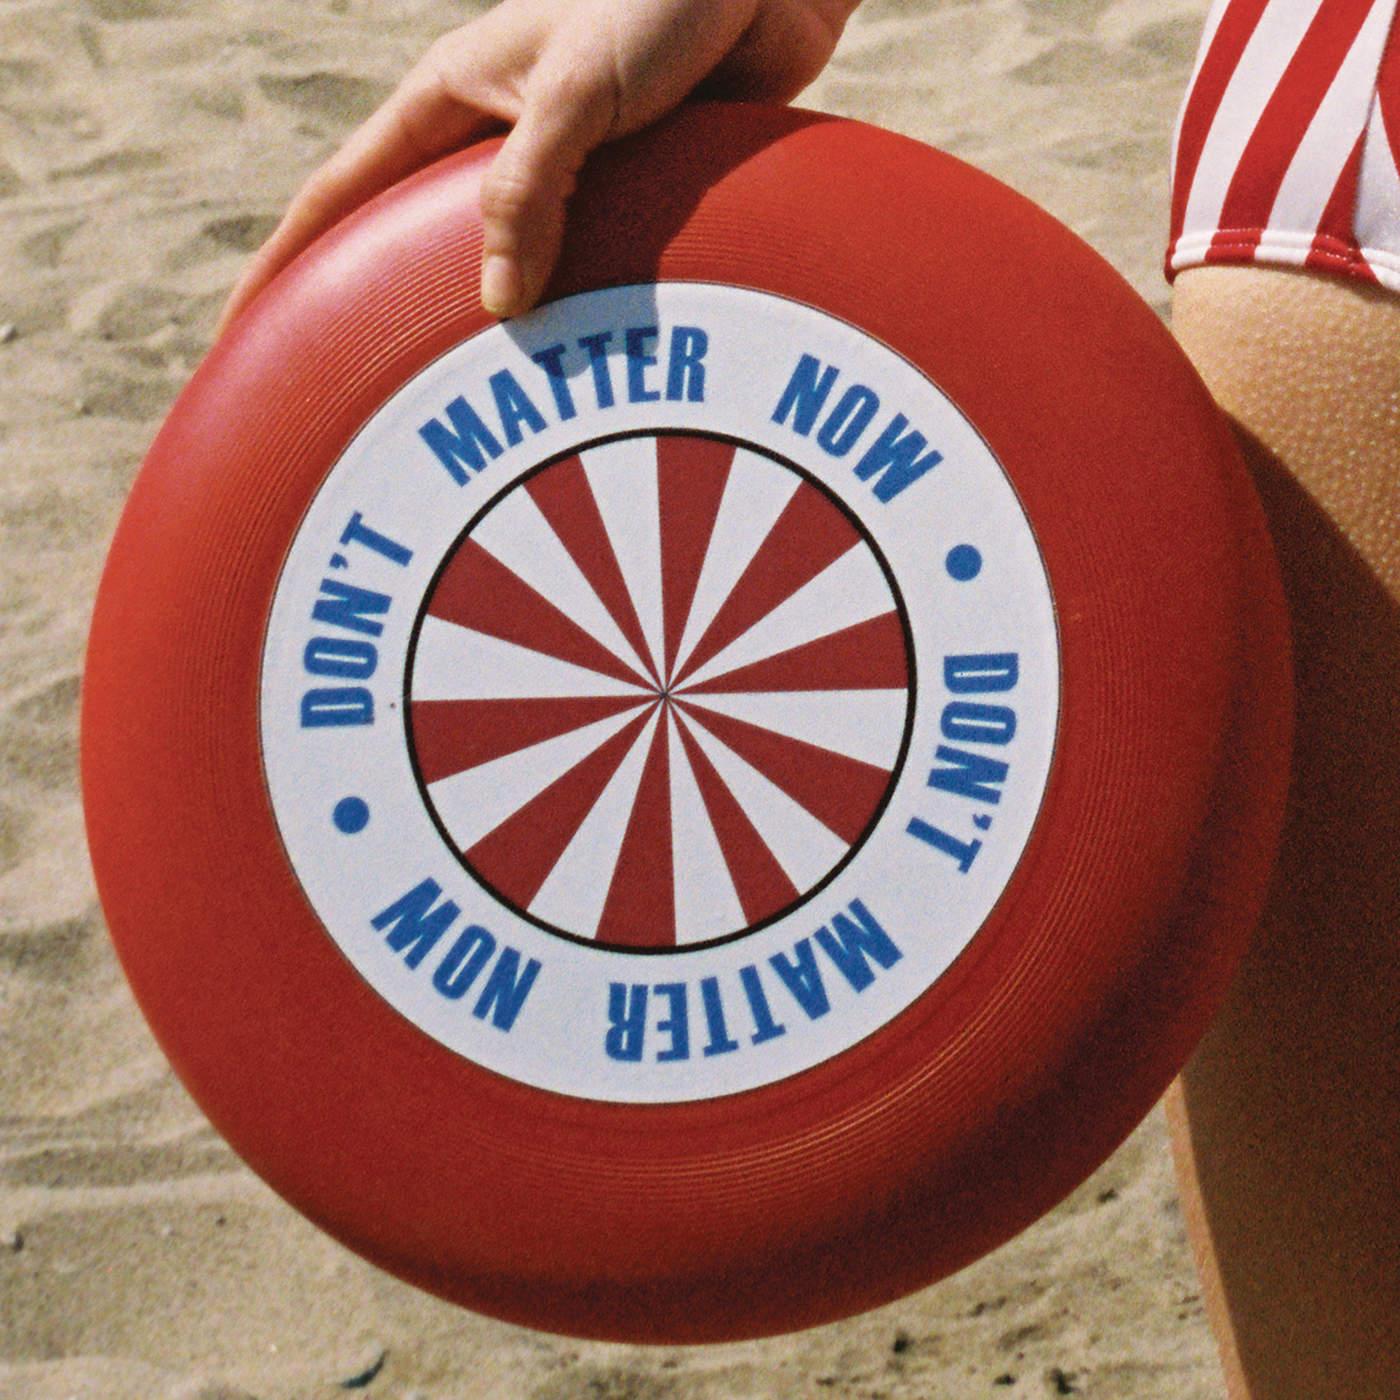 George Ezra - Don't Matter Now - Single